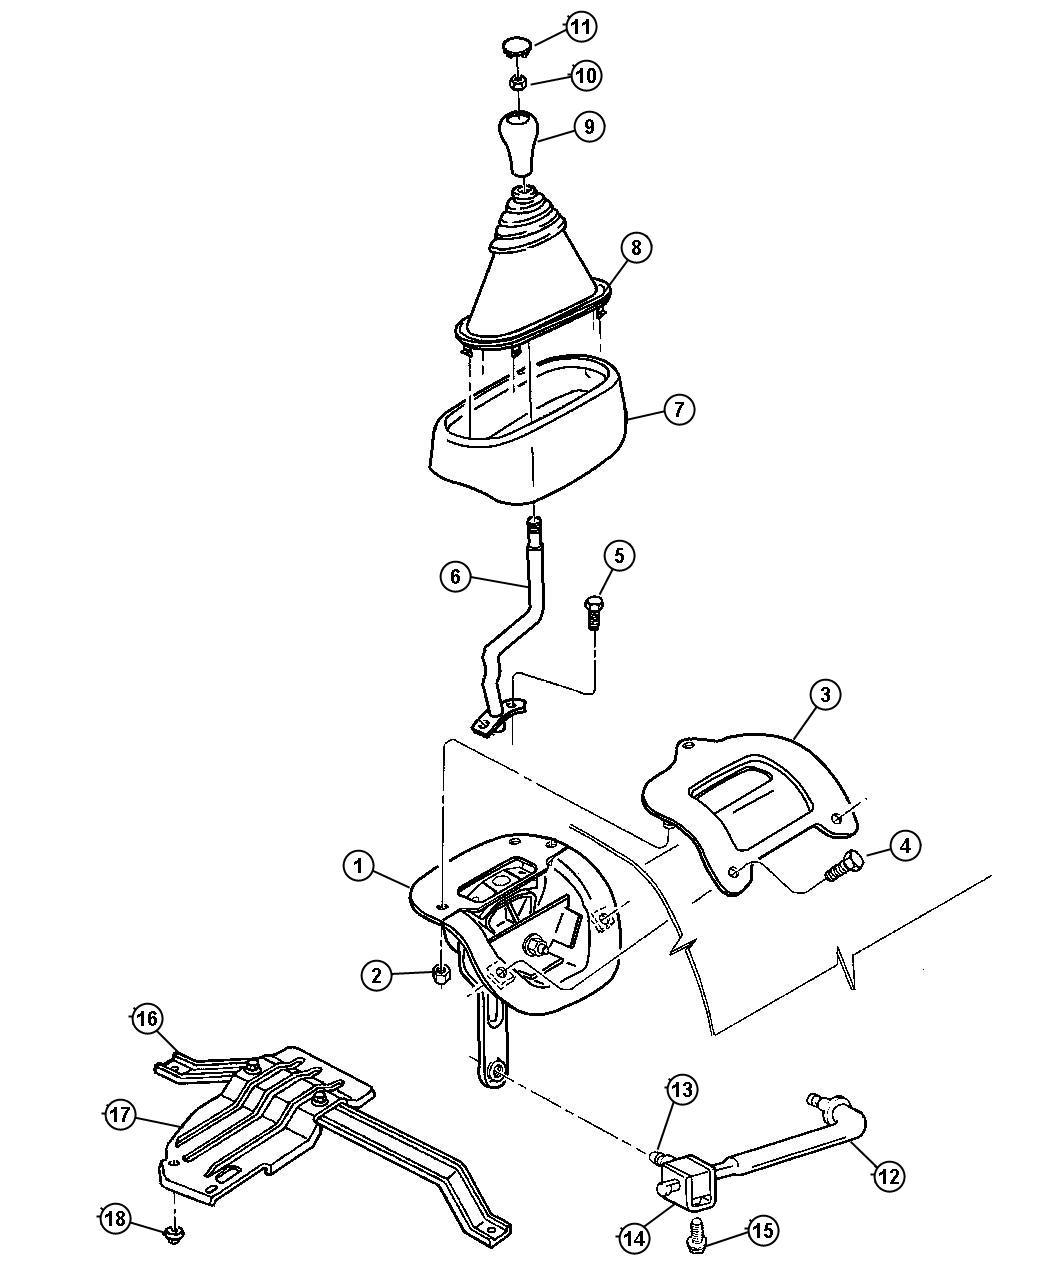 52105006 mopar rod gear shift control transfer case. Black Bedroom Furniture Sets. Home Design Ideas